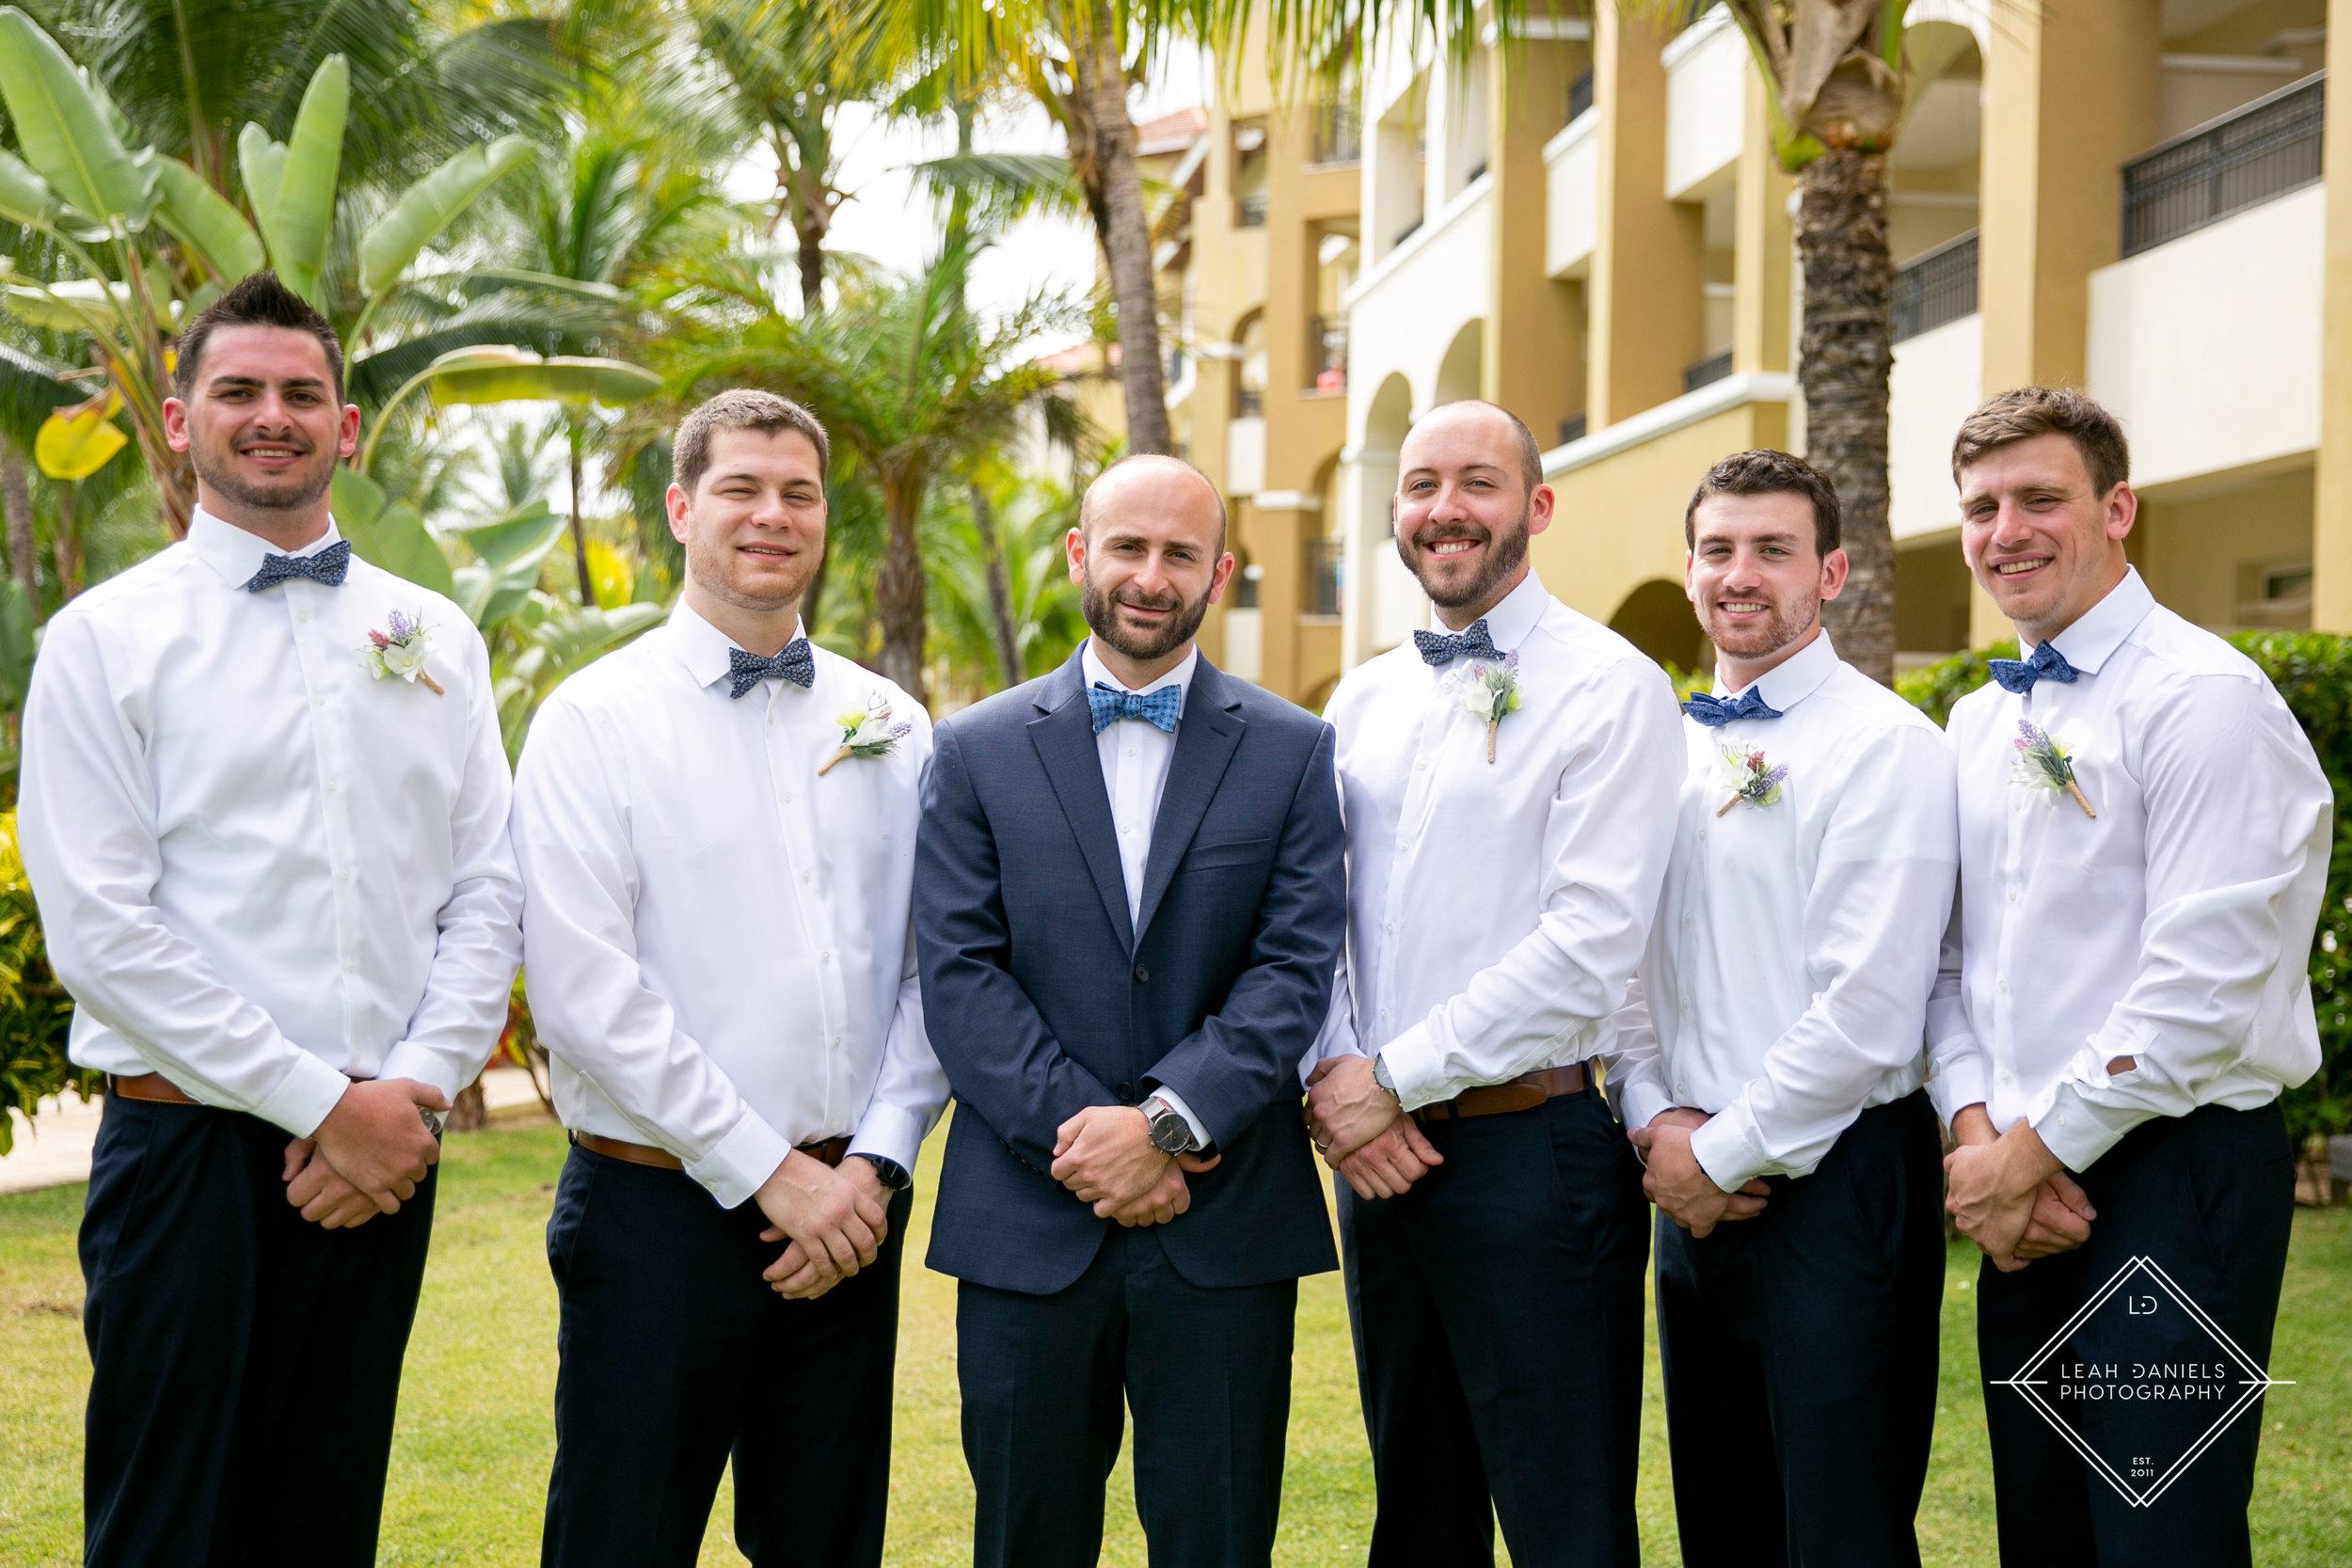 NOW Larimar Destination Wedding Photos; The Groomsmen